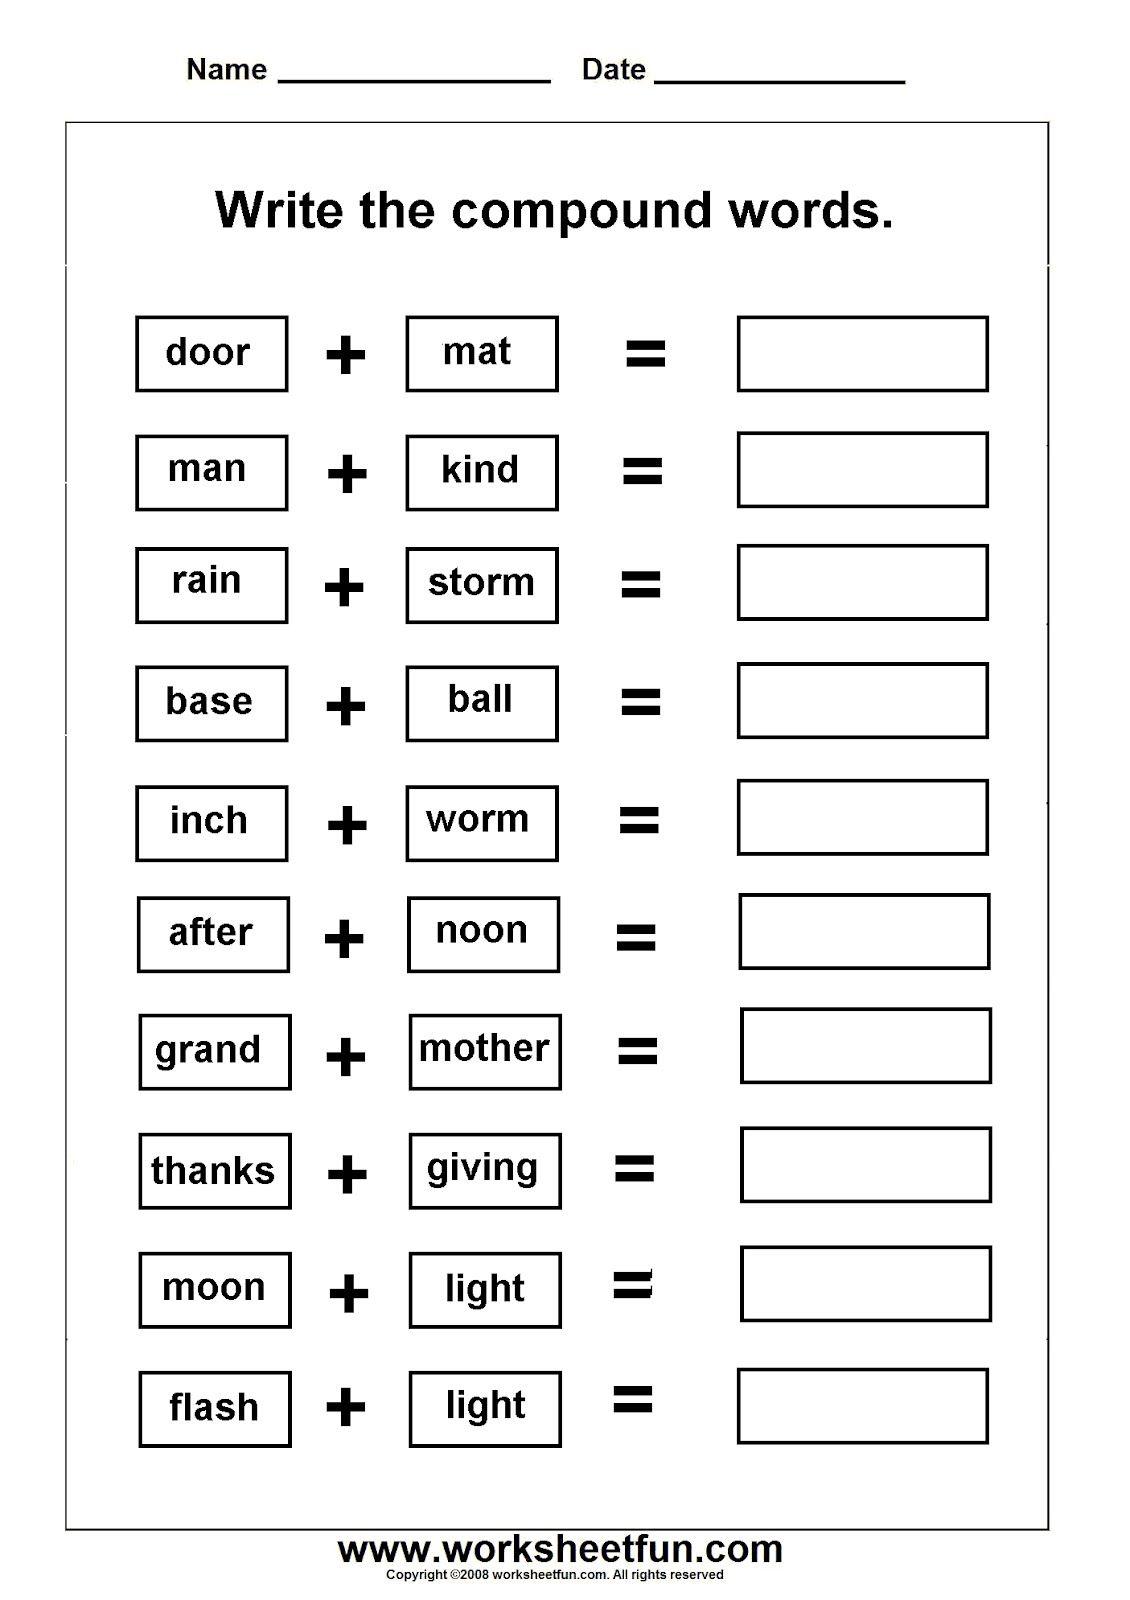 Printable Compound Word Crossword Puzzle